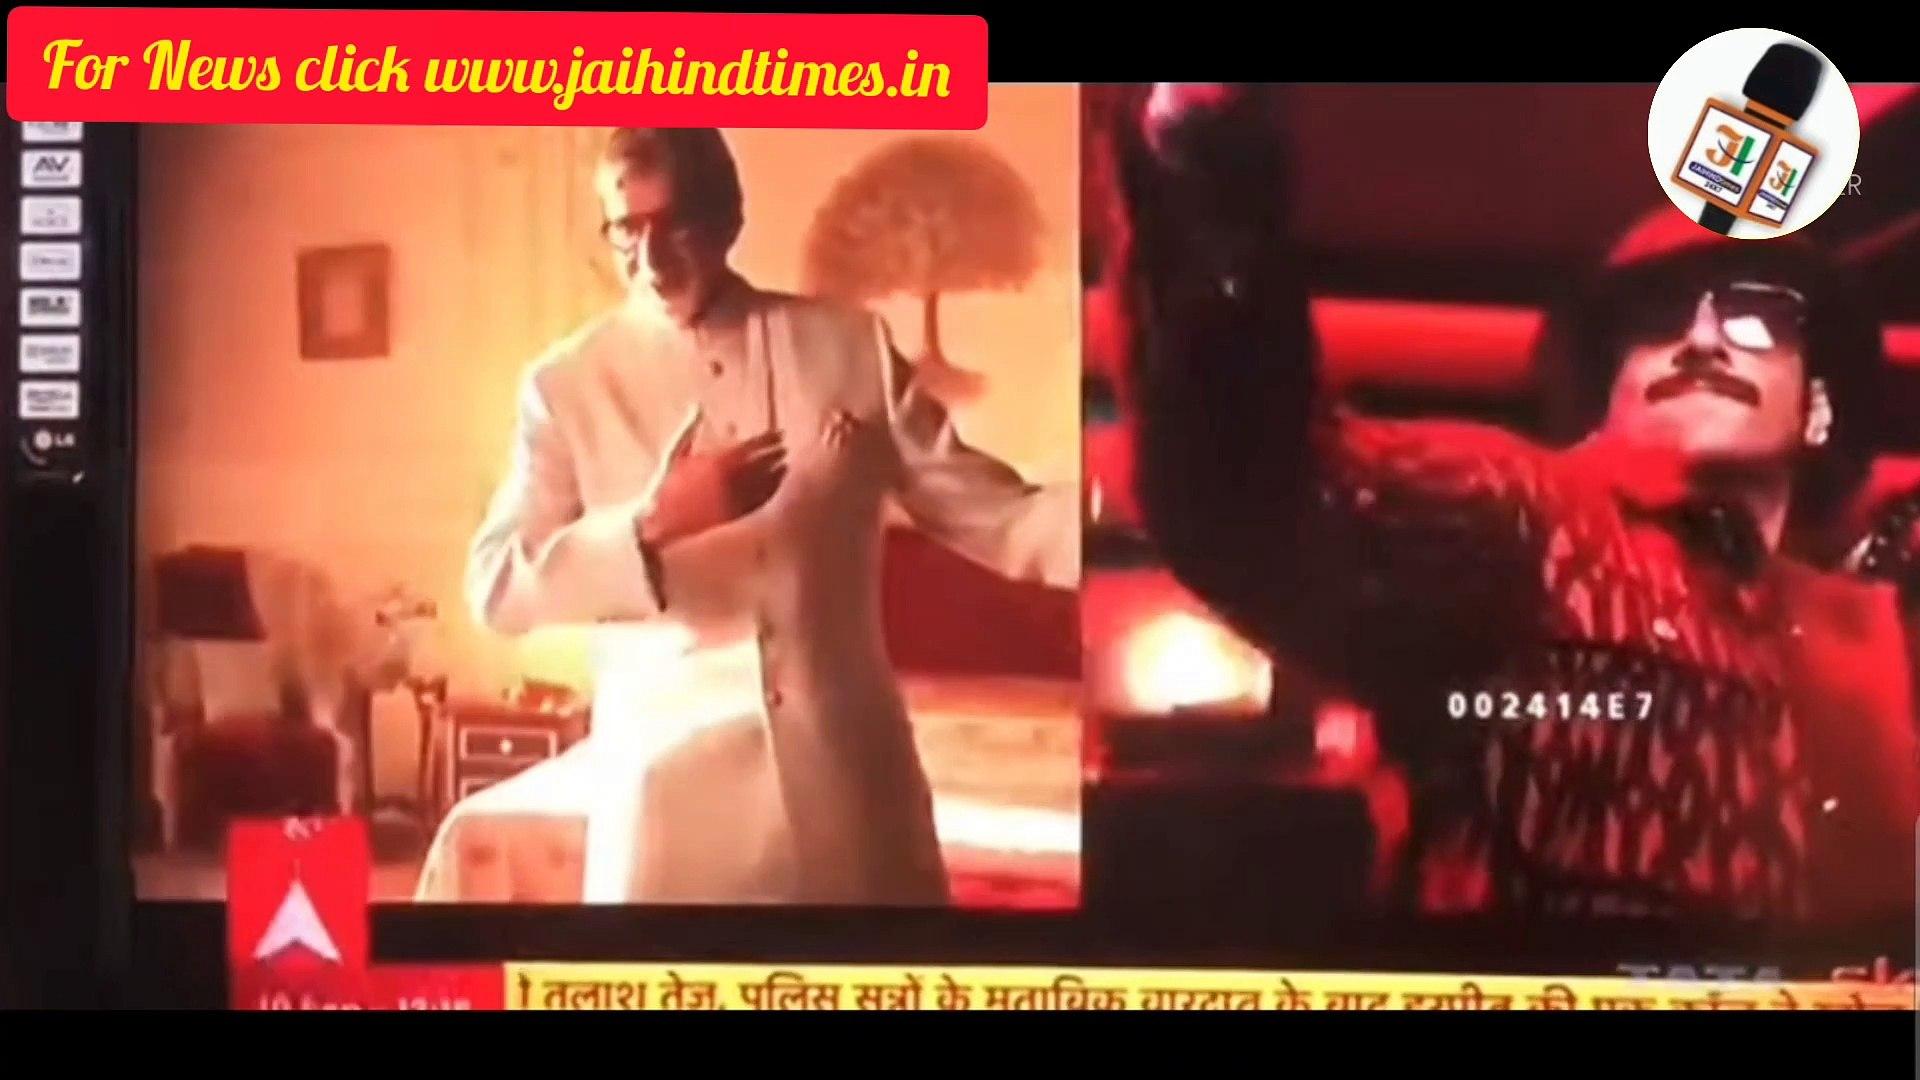 Amitabh Bachchan selling kamla pasand / Amitabh bacchan troll / Amitabh bacchan trending